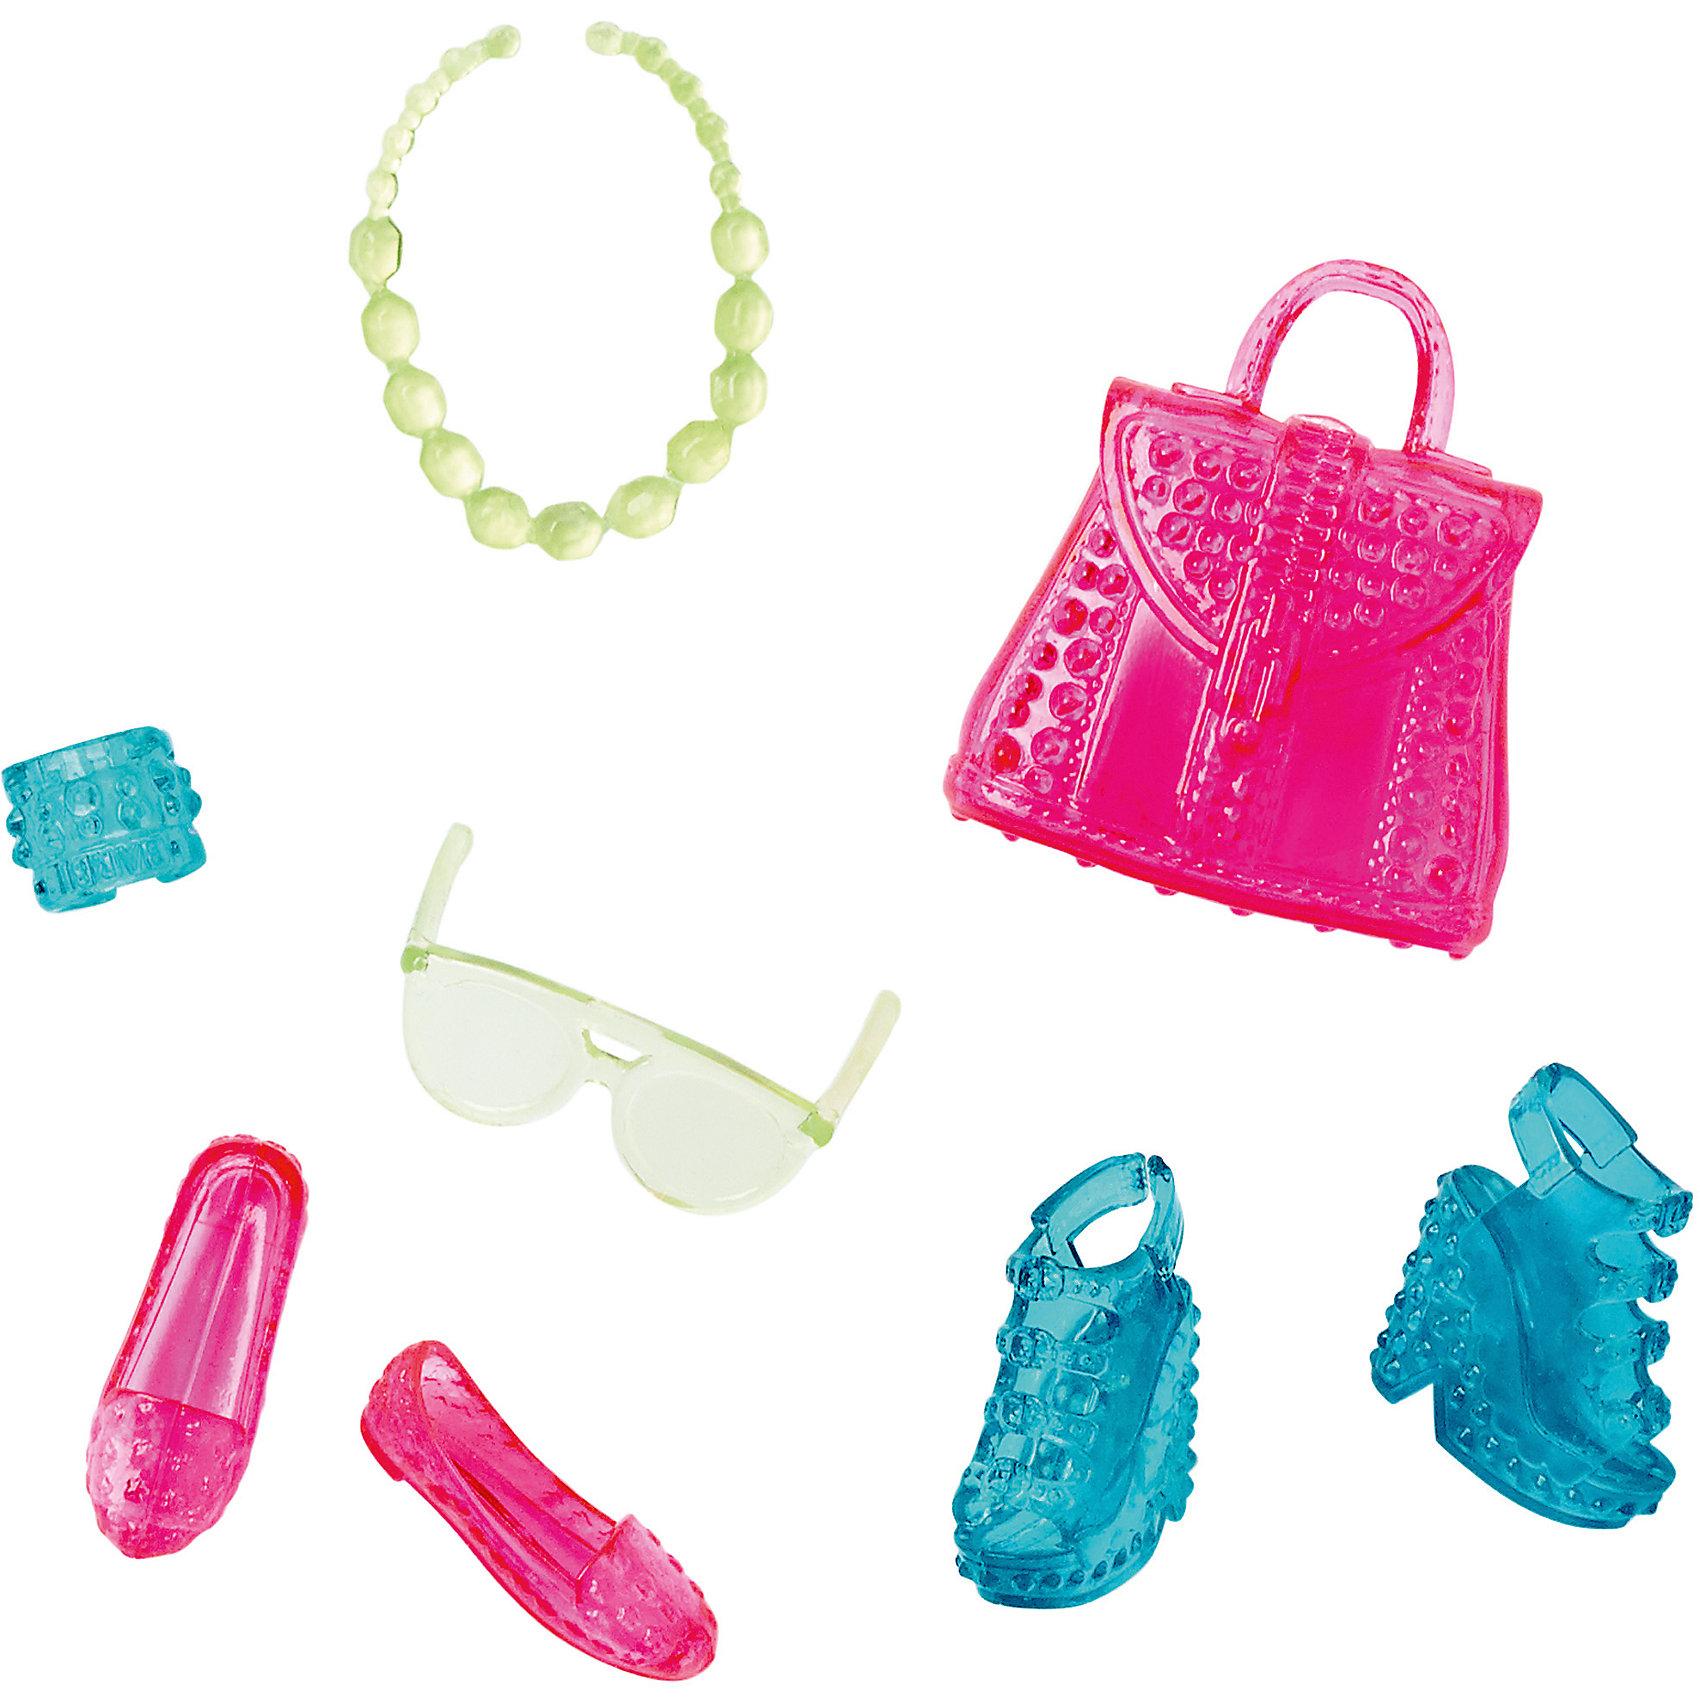 Mattel Набор Игра с модой, Barbie куклы и одежда для кукол barbie mattel кен из серии игра с модой fnh40